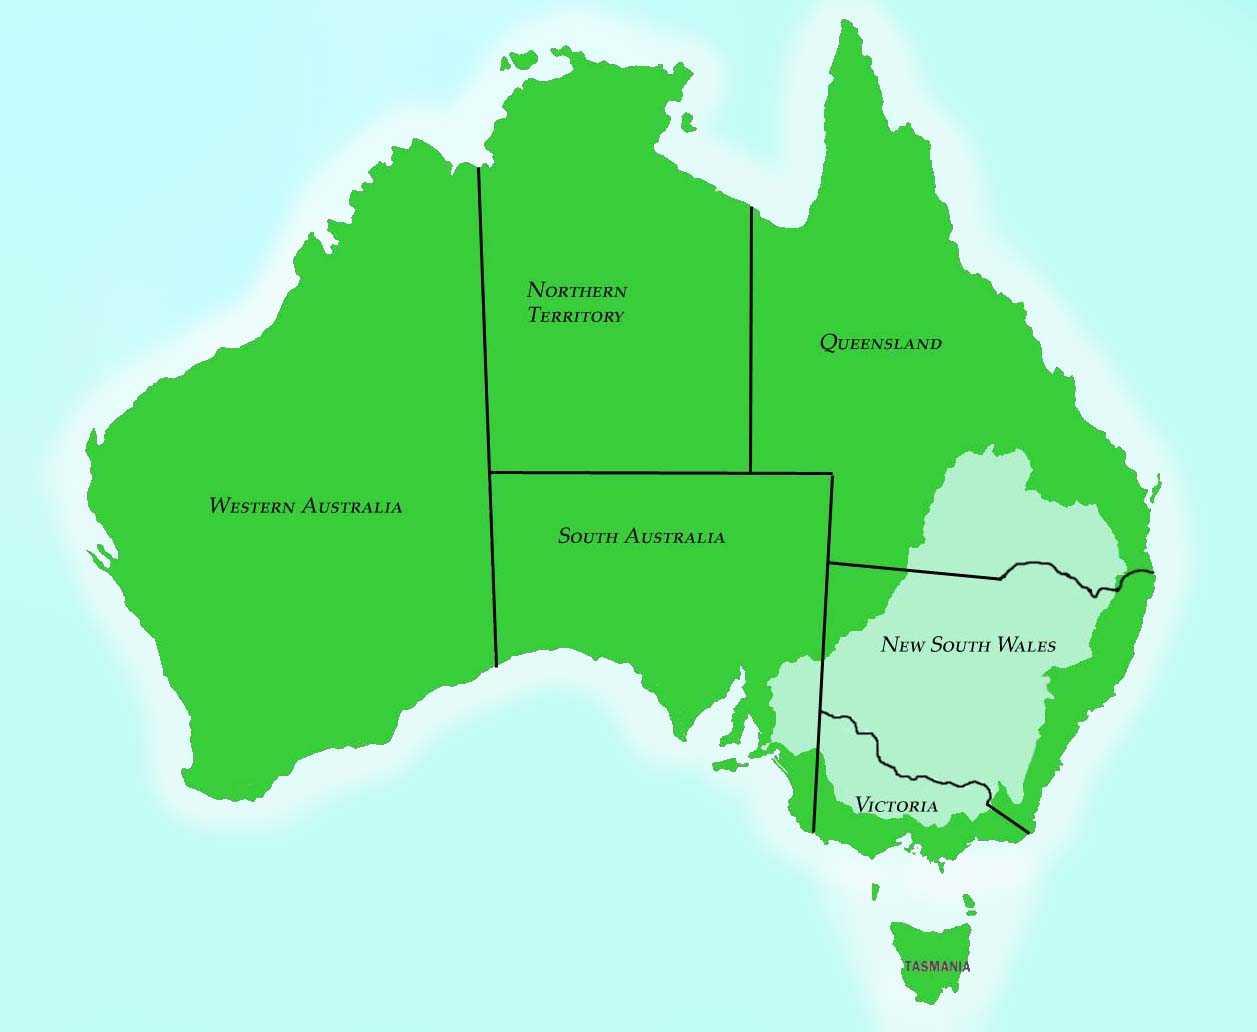 Australia's healthcare system